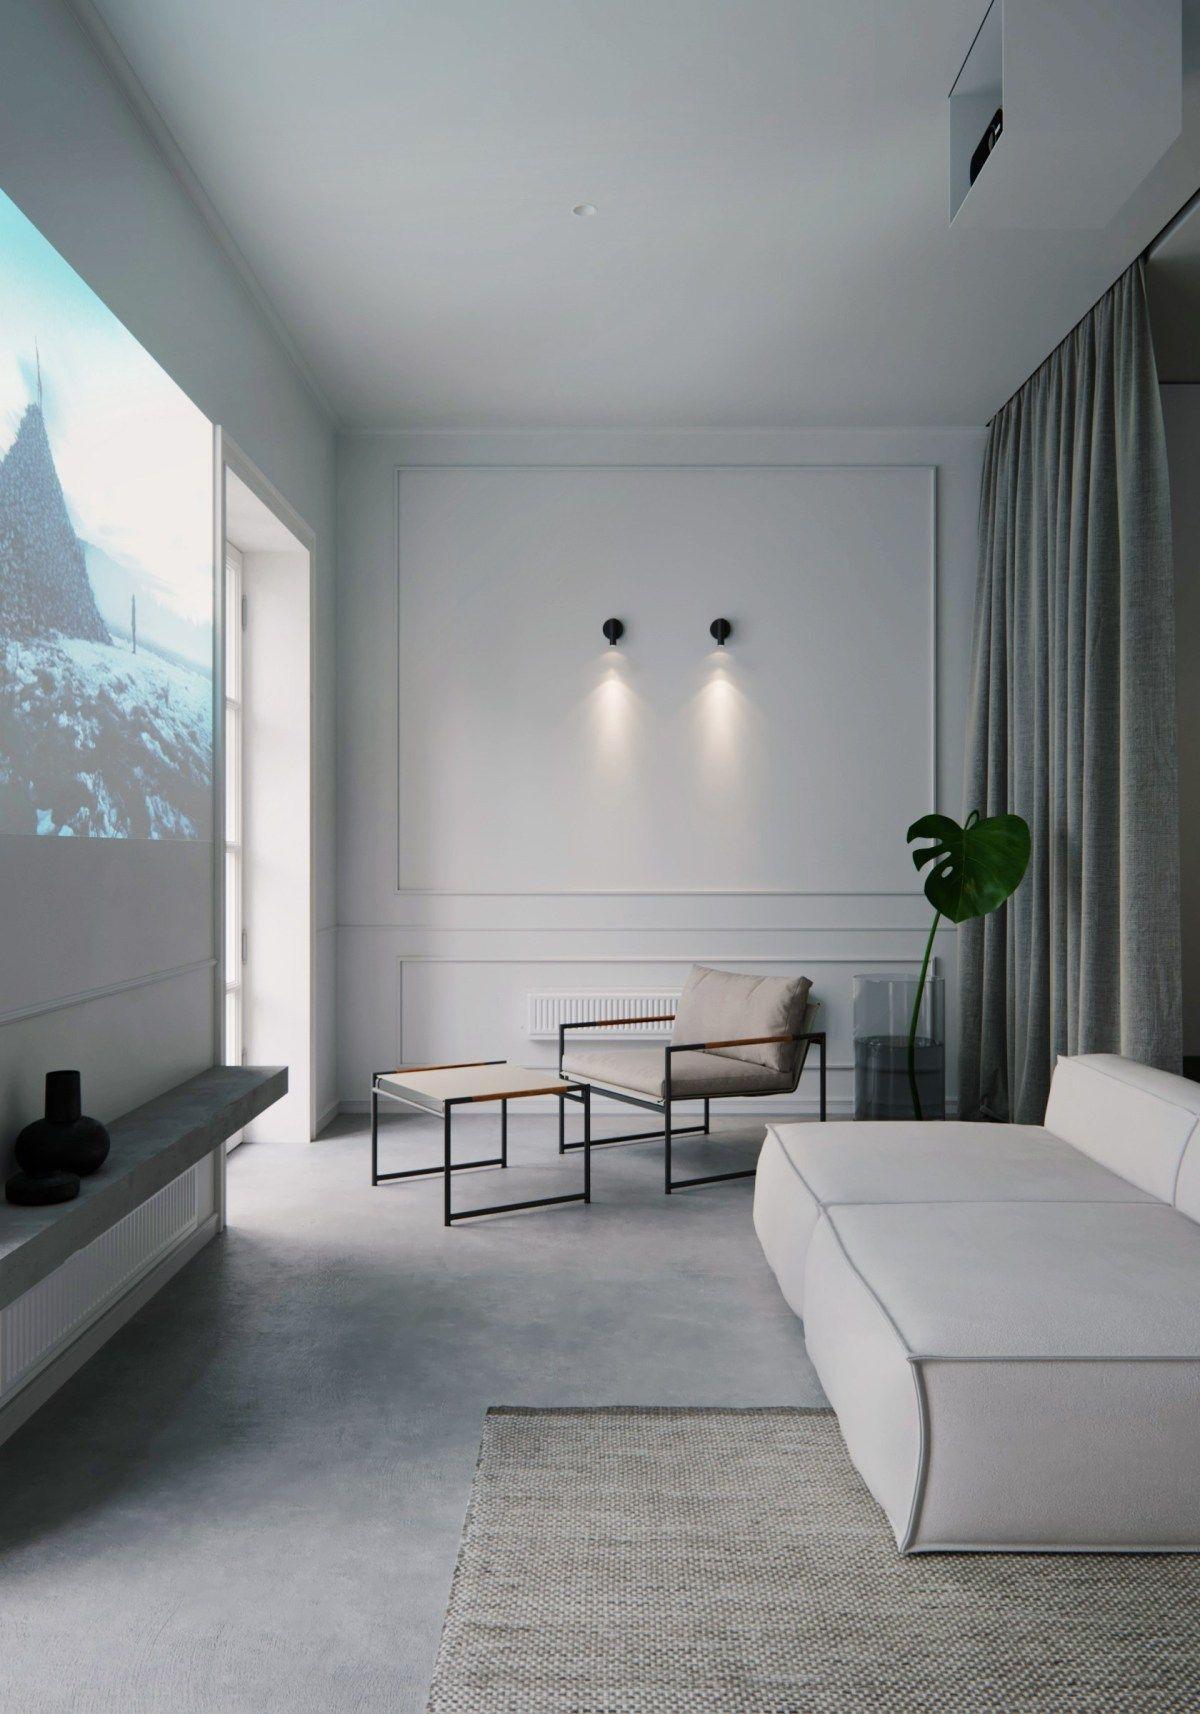 Saint P Apartment Design Ideas Stunning Interior Design Minimalist Interior Design Apartment Interior